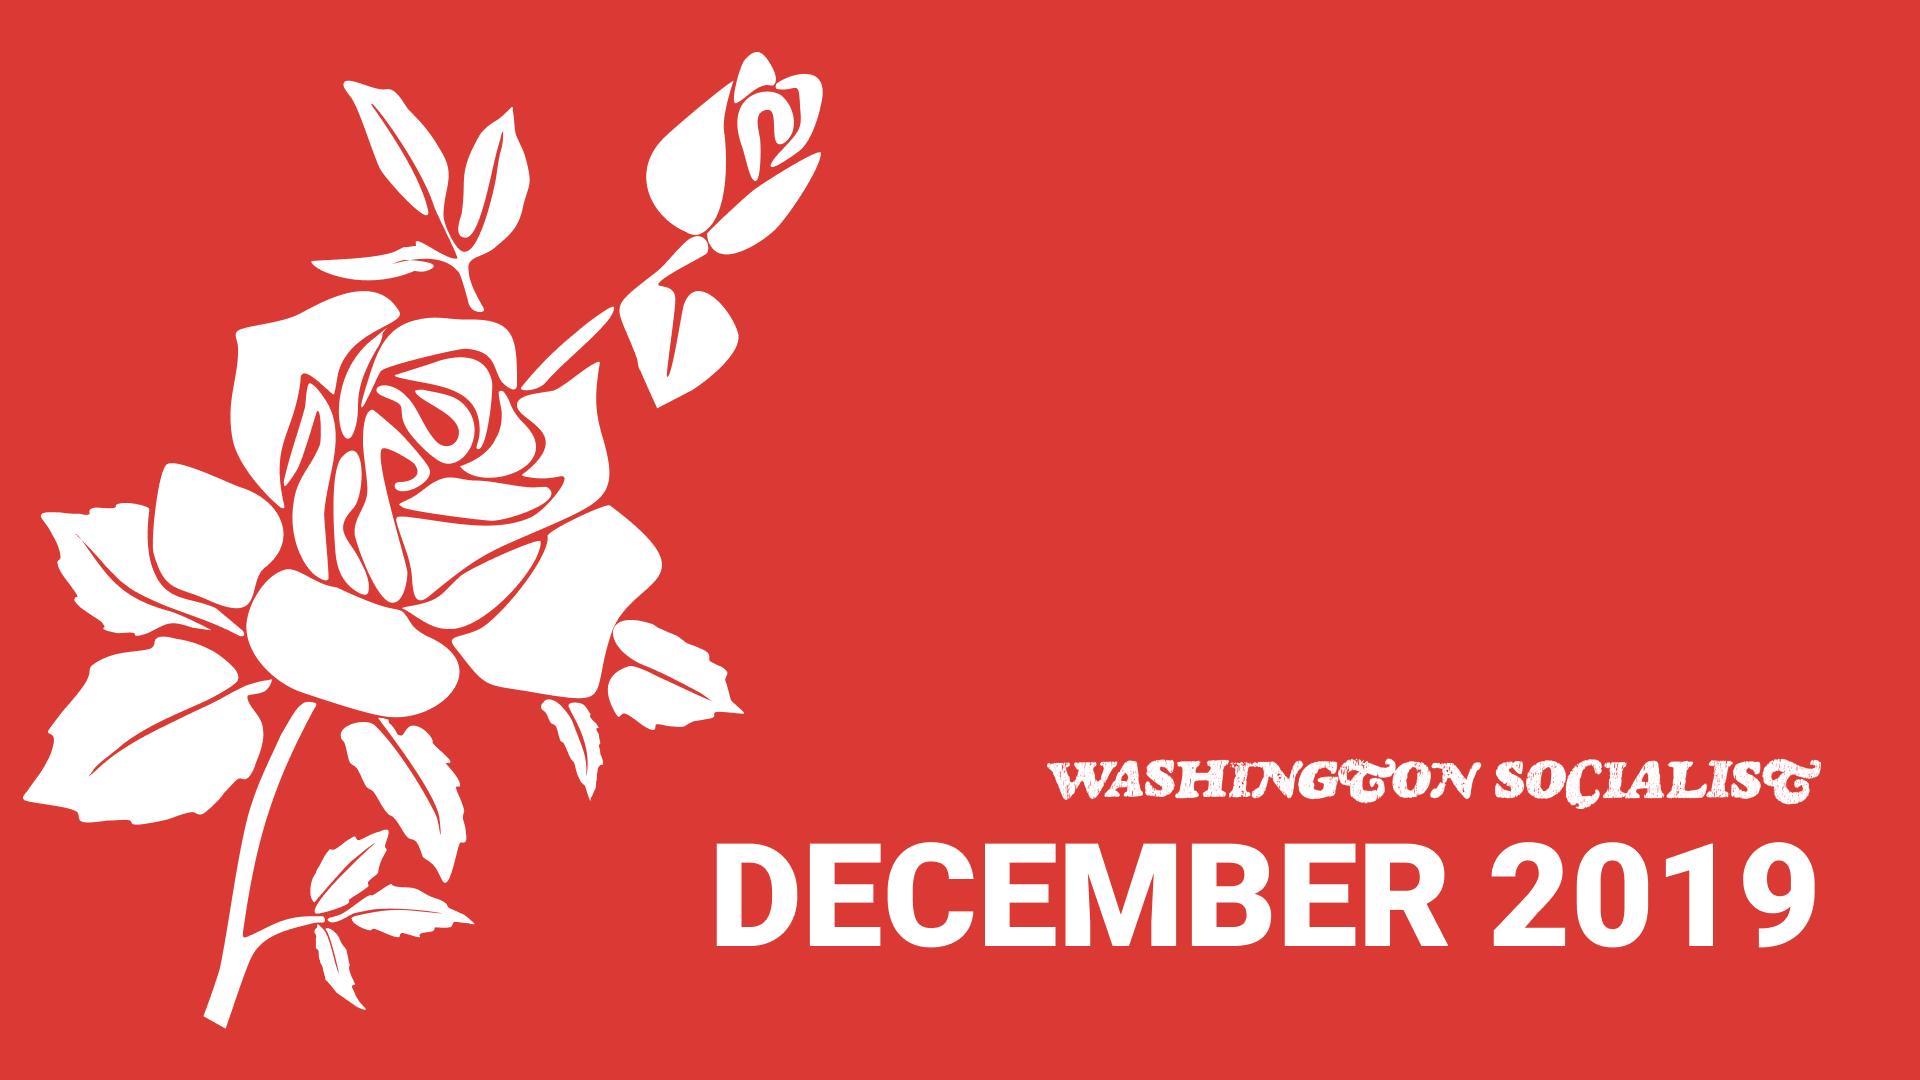 Washington Socialist Cover, December 2019